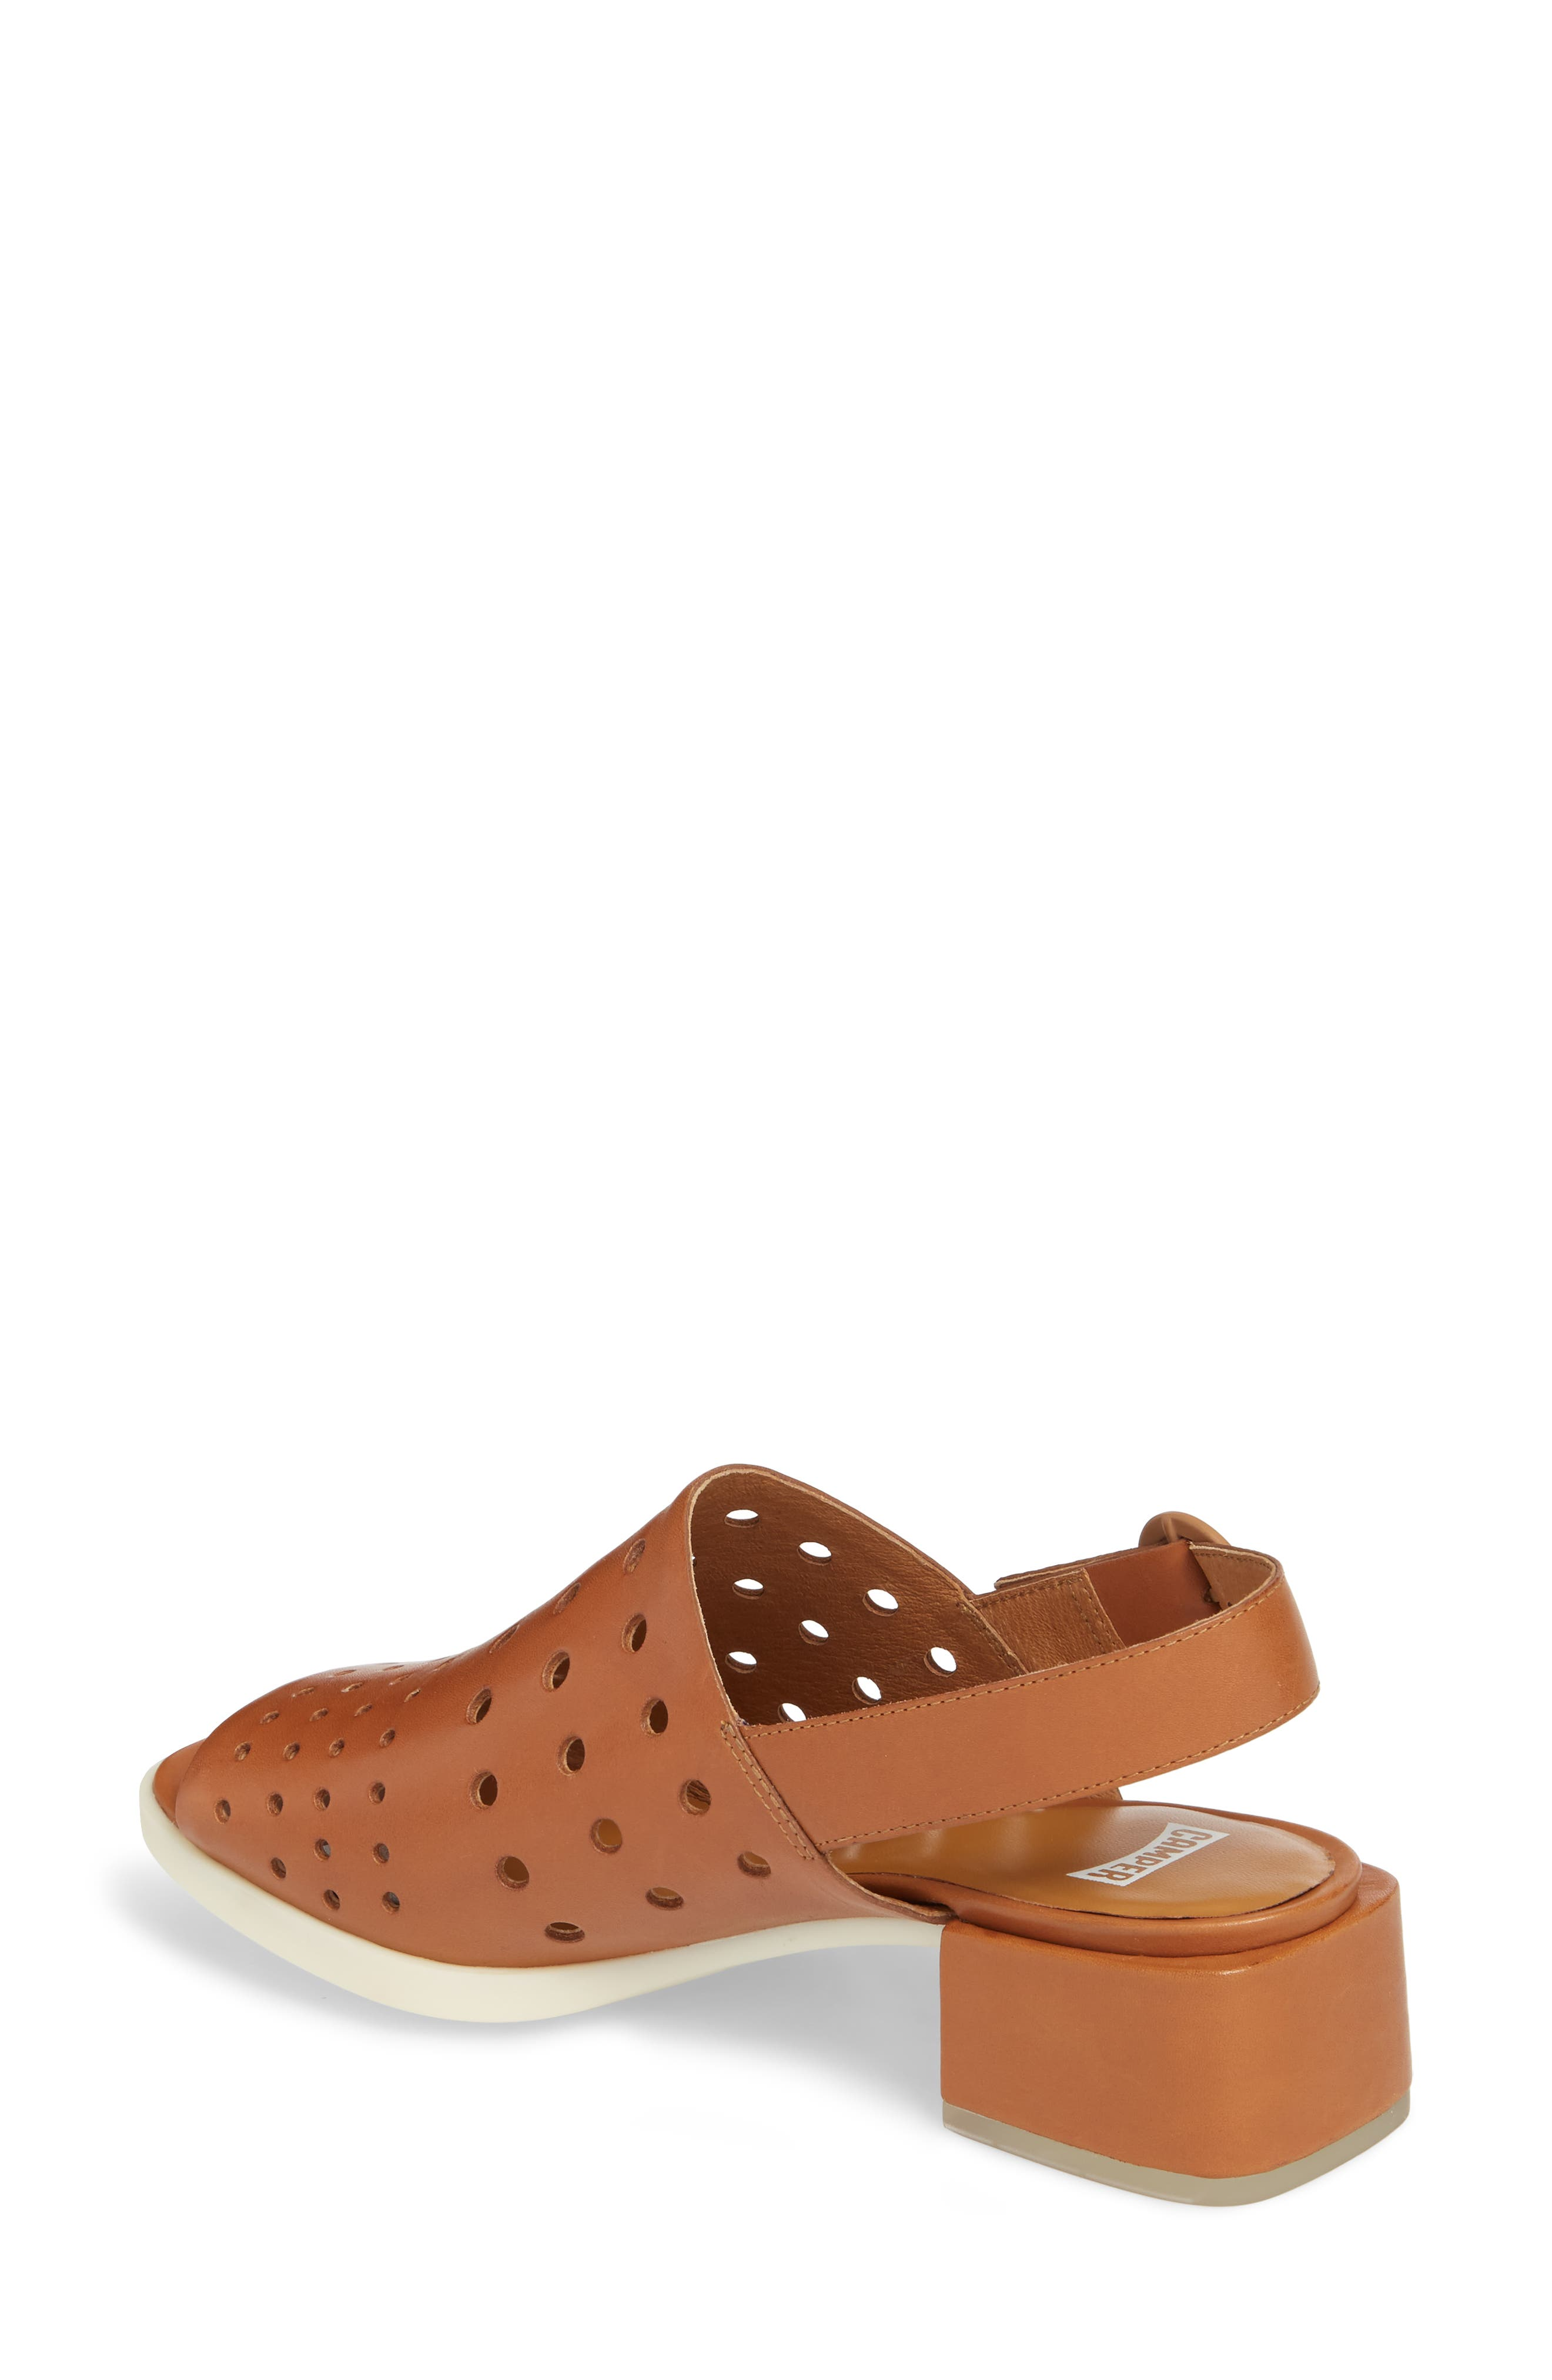 Twins Sandal,                             Alternate thumbnail 2, color,                             Rust/ Copper Leather